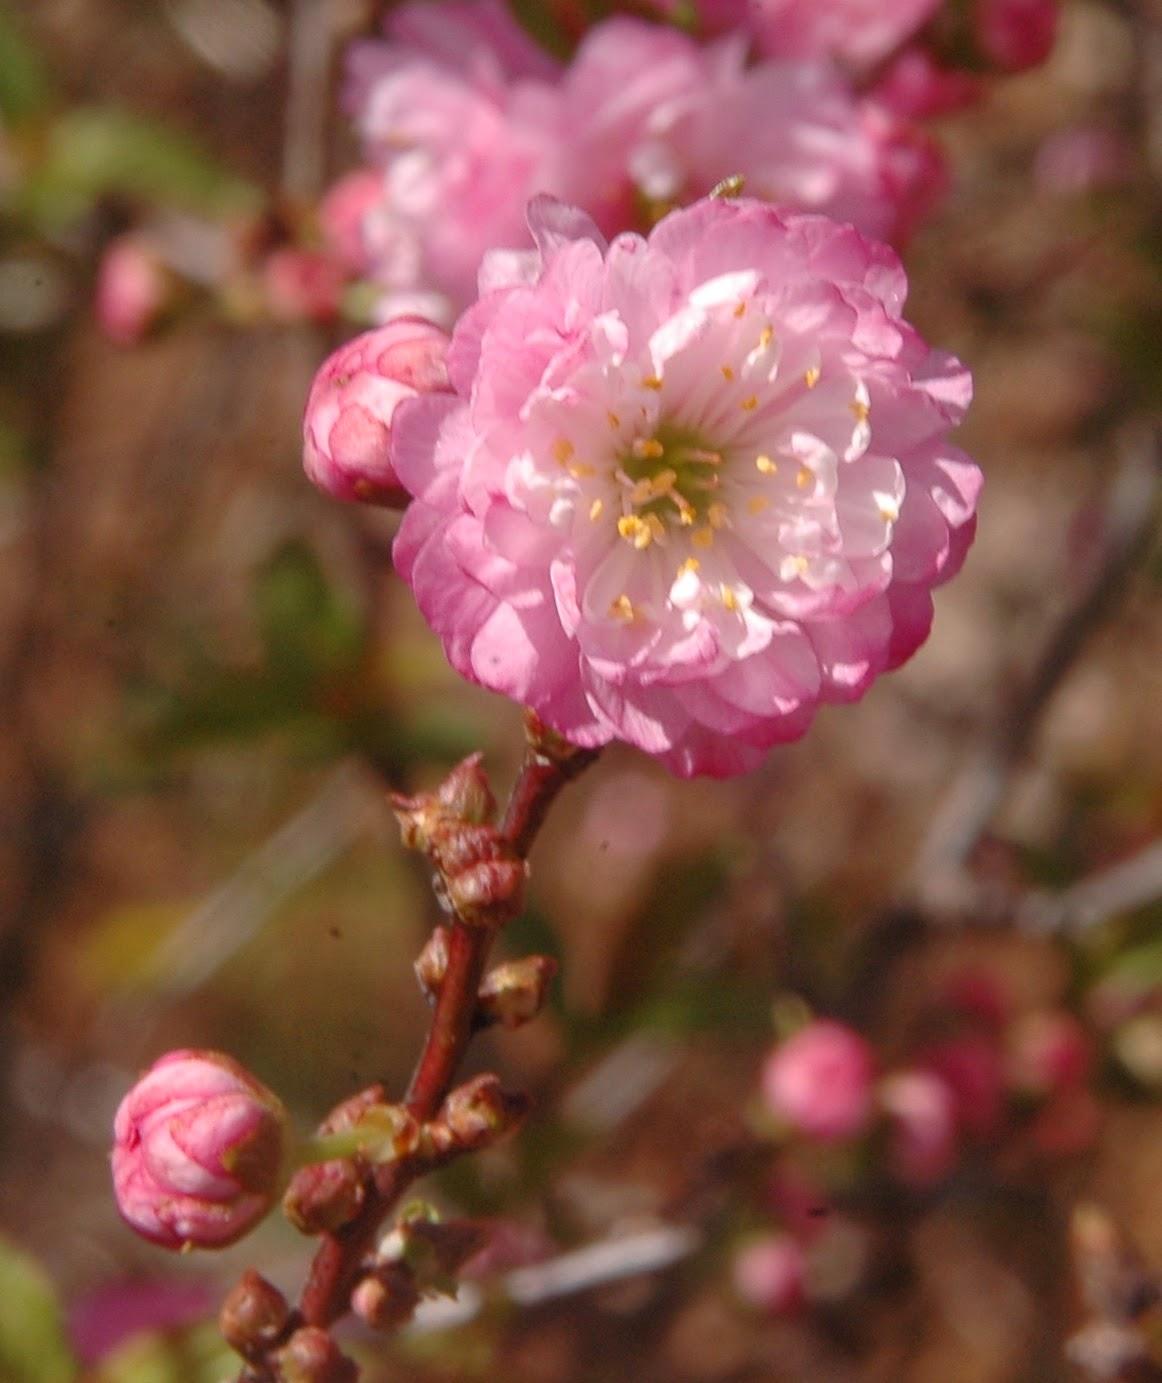 The Nature of Robertson Prunus glandulosa Sinensis Double flower